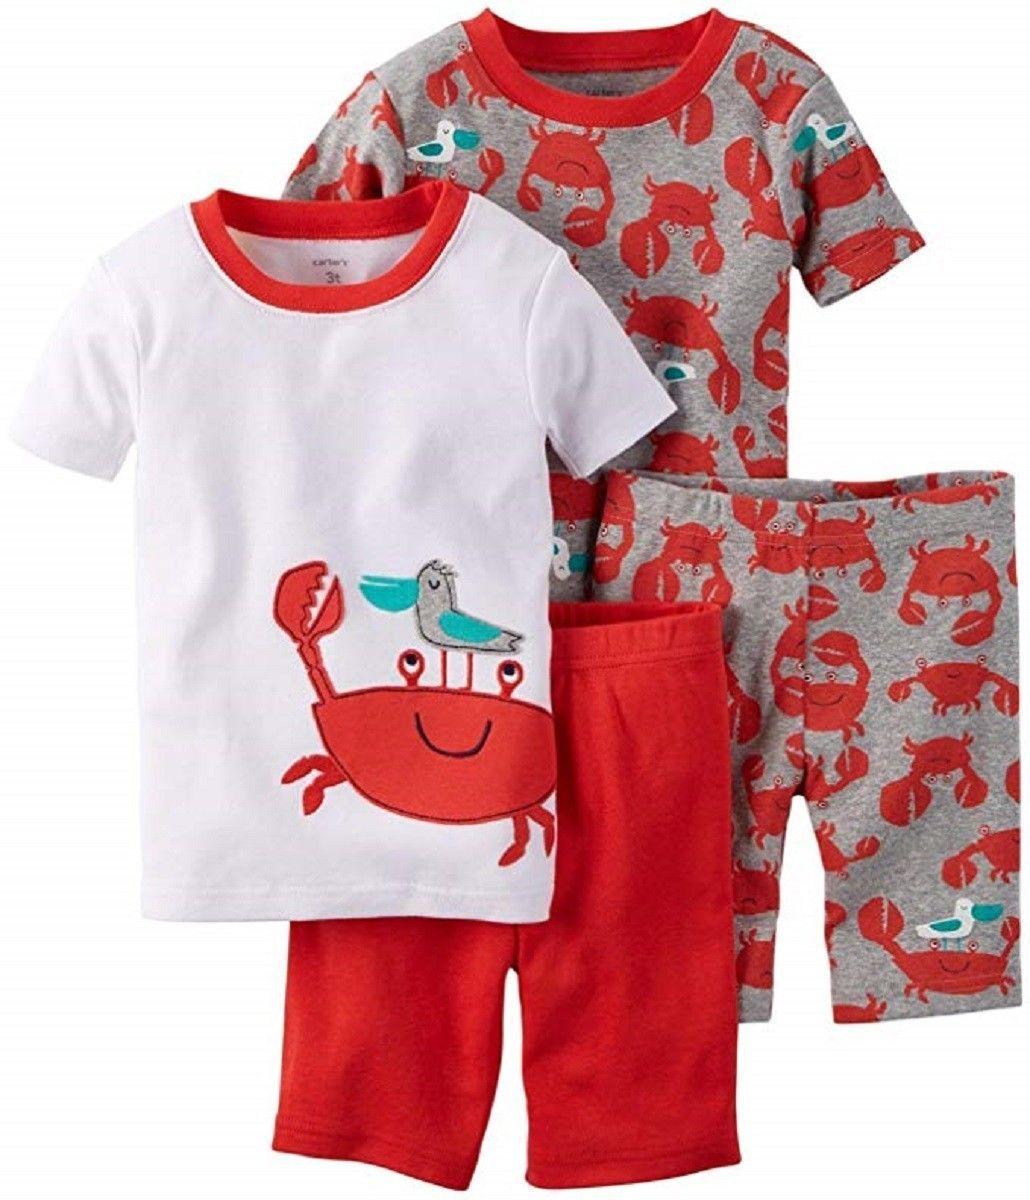 e027581202f6 Sleepwear 147336  Carter S Baby Boys 4-Piece Pajama Set - Crab - 9 ...